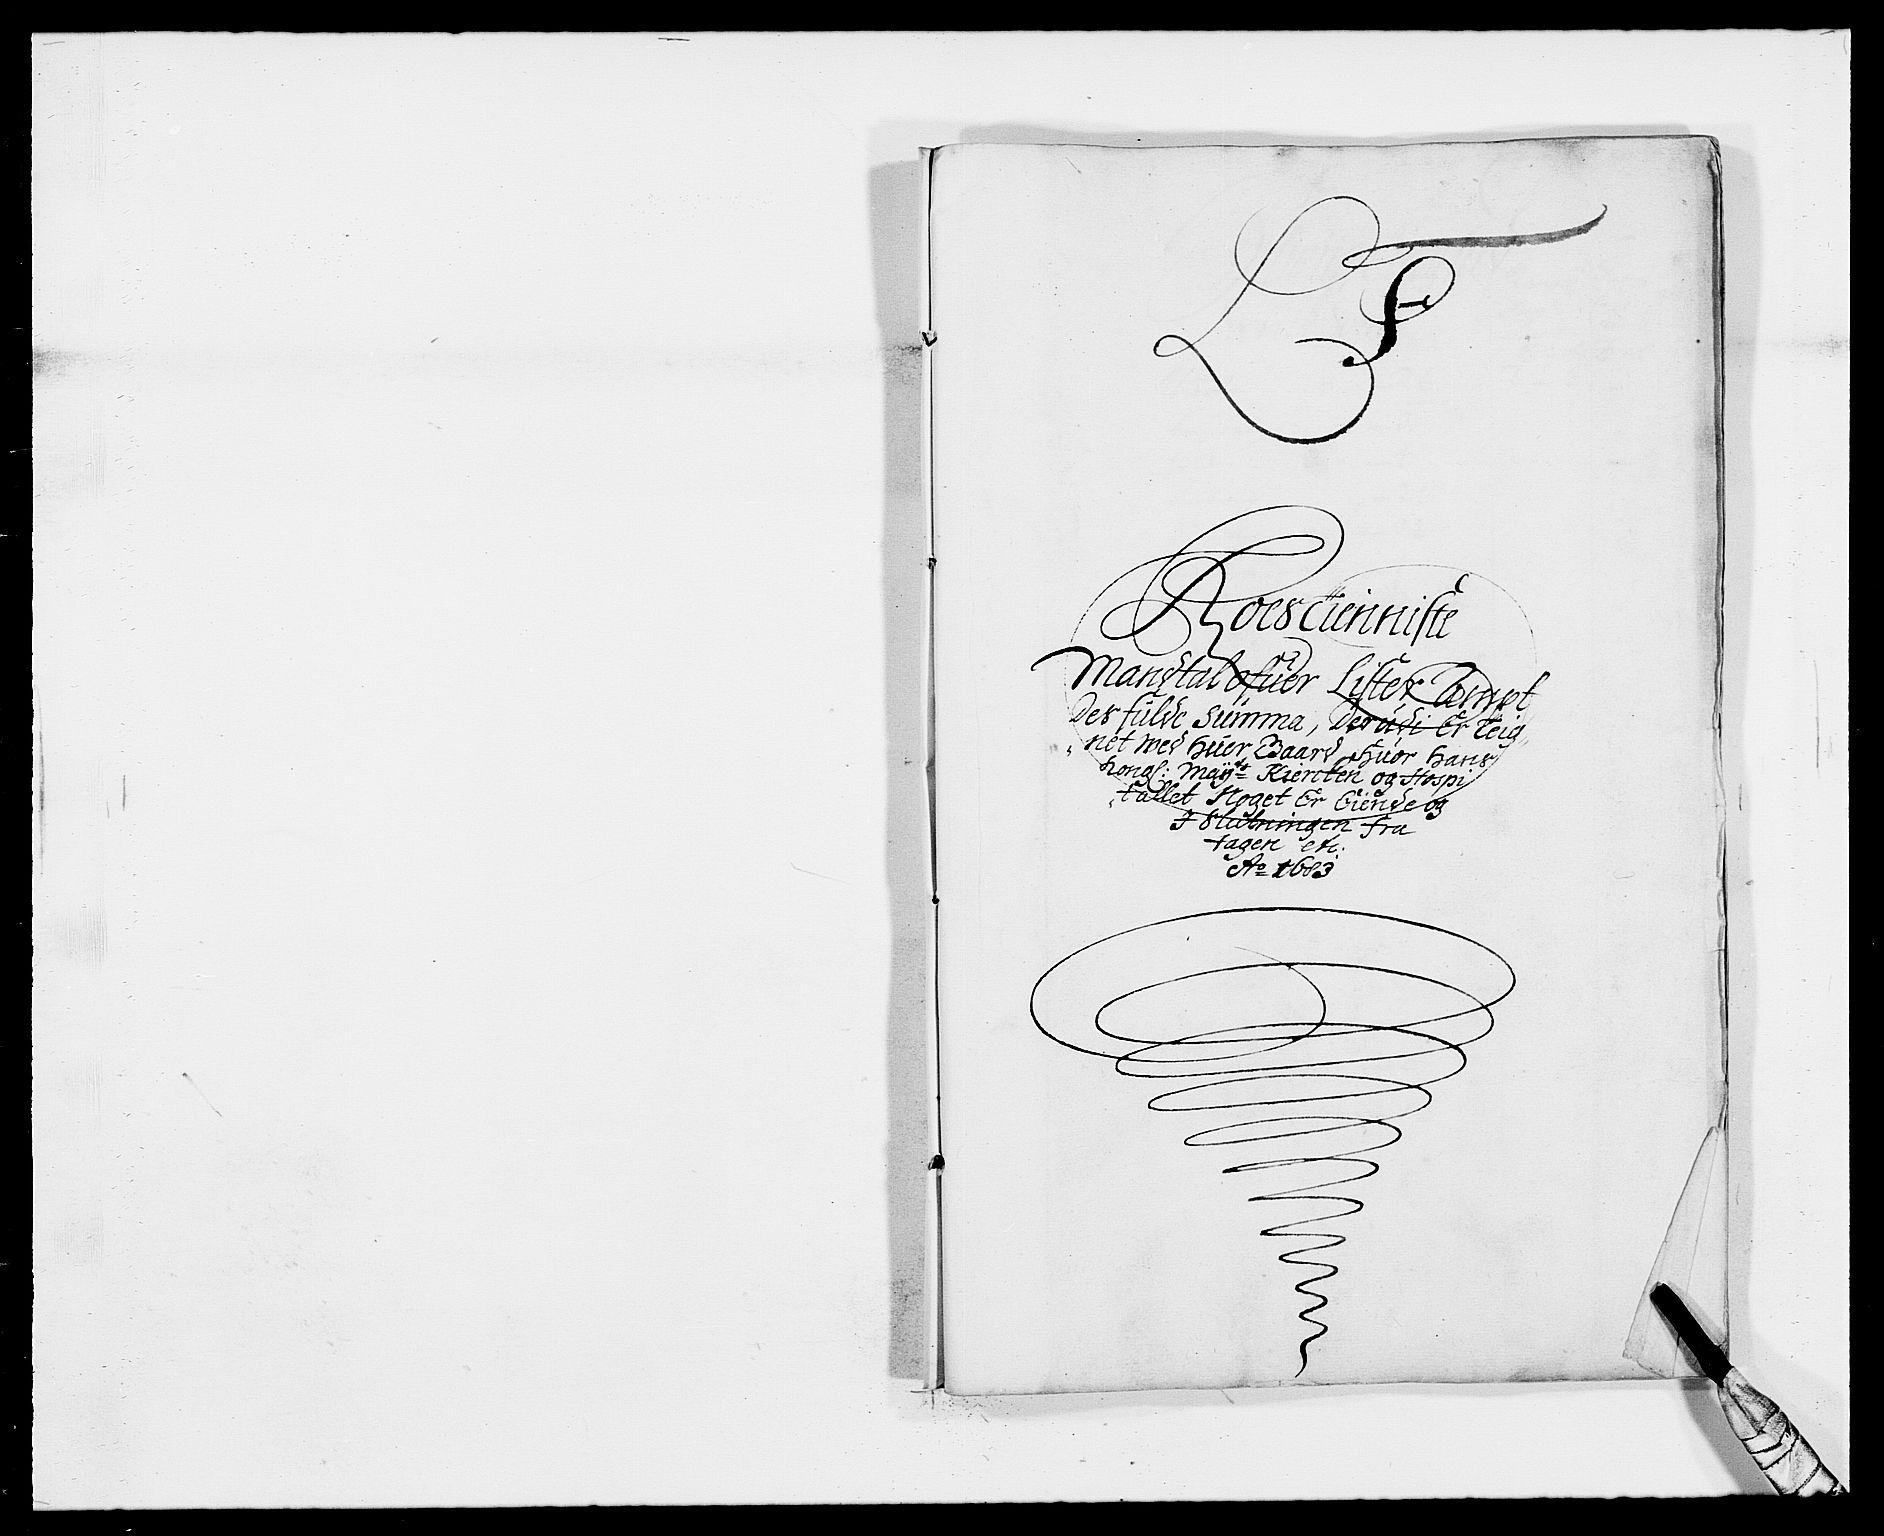 RA, Rentekammeret inntil 1814, Reviderte regnskaper, Fogderegnskap, R41/L2532: Fogderegnskap Lista, 1683, s. 133